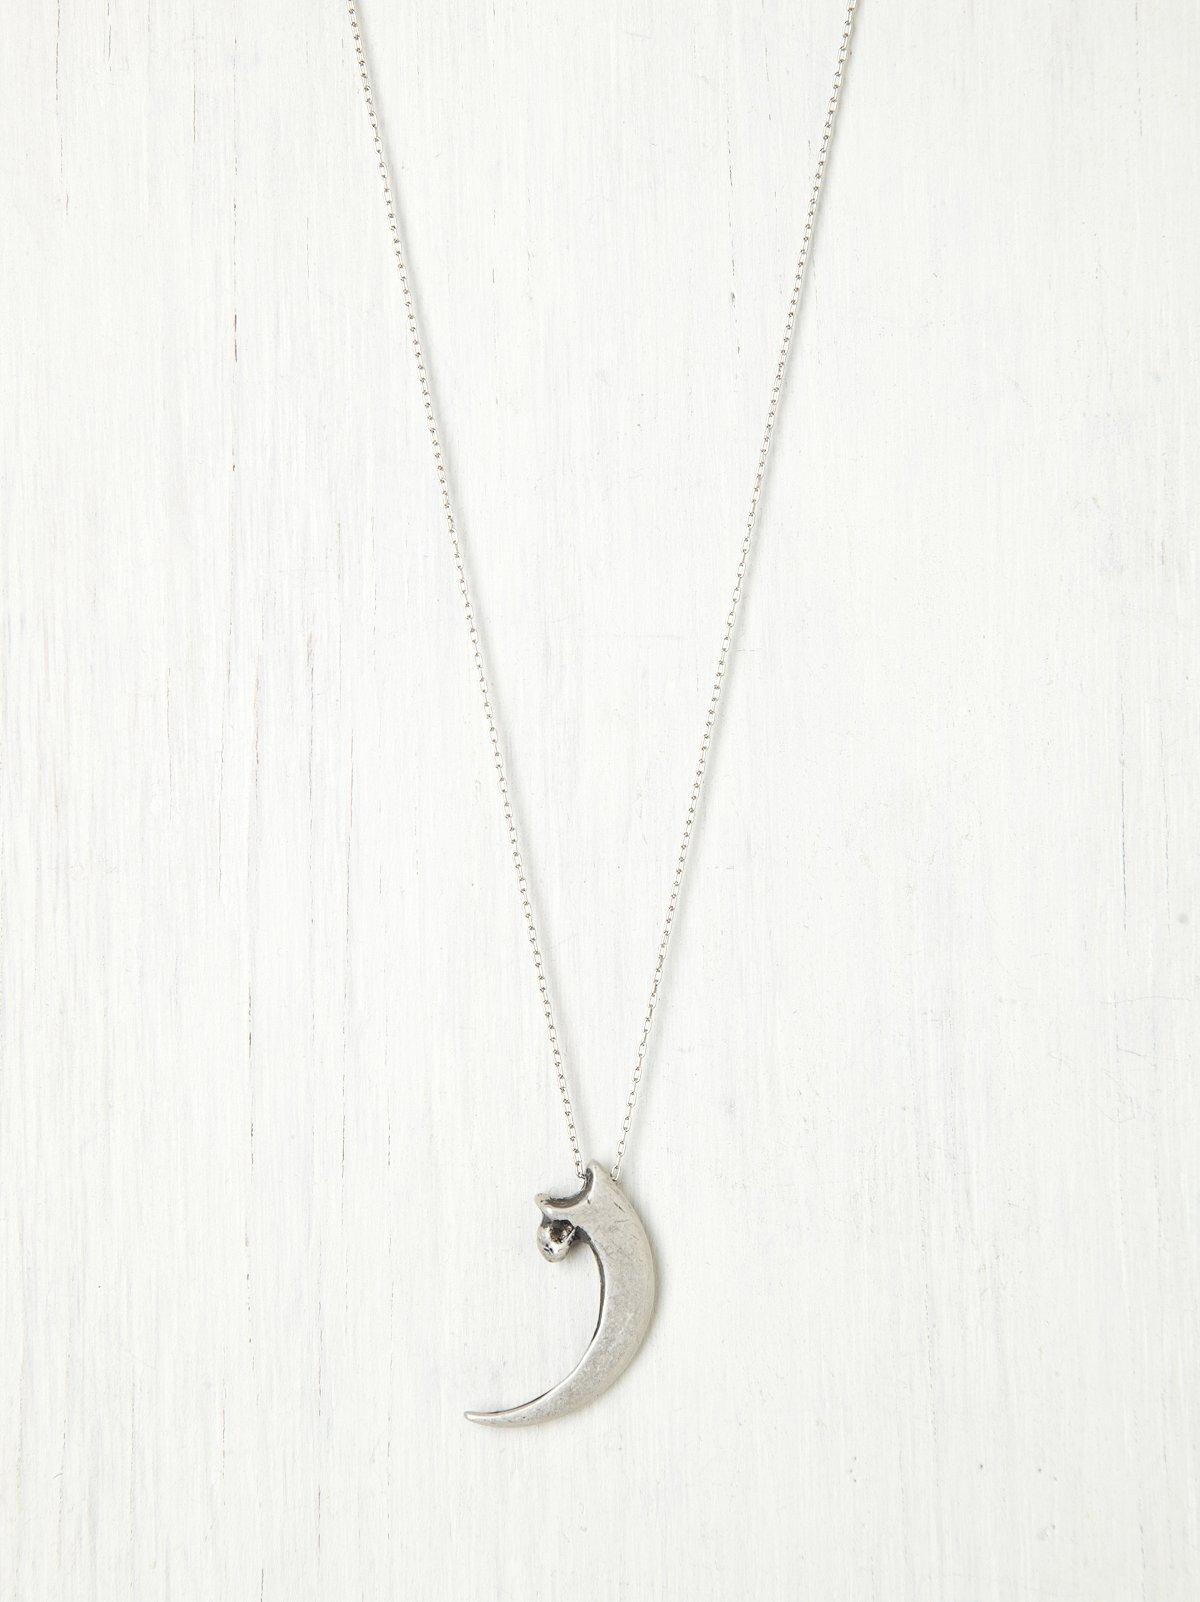 Eagle Talon Necklace